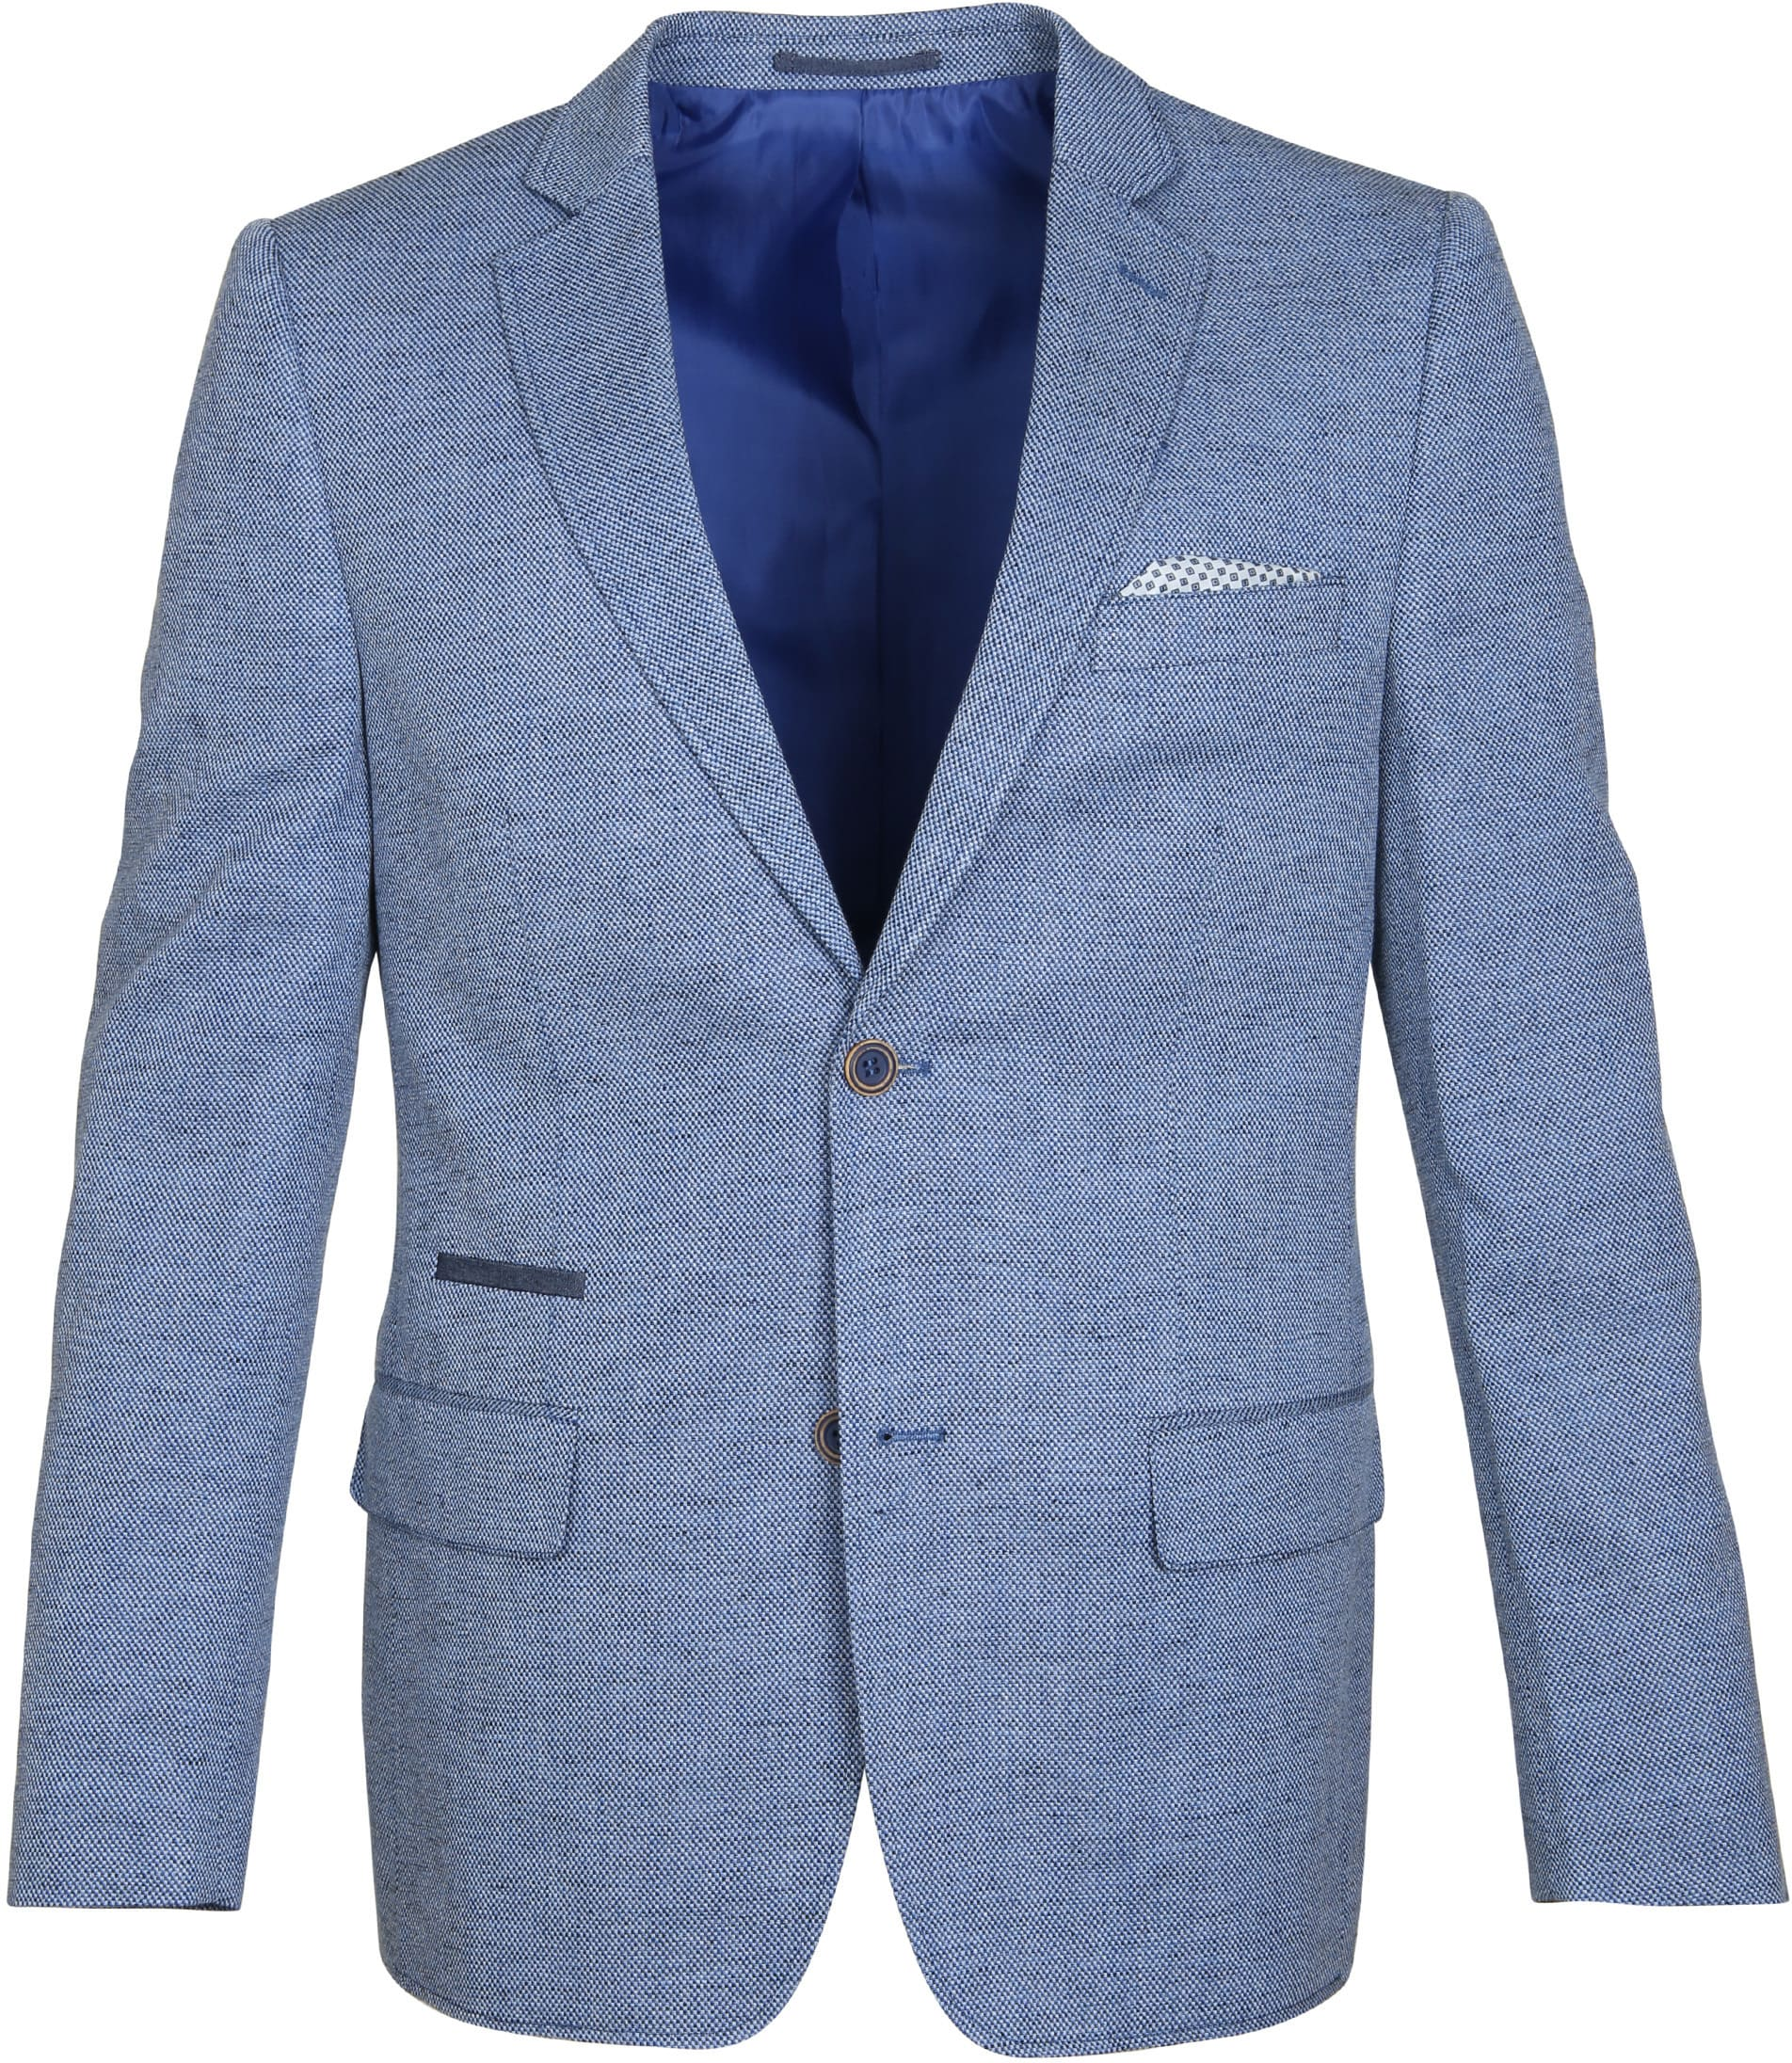 Suitable Blazer LeLuc Blau foto 0